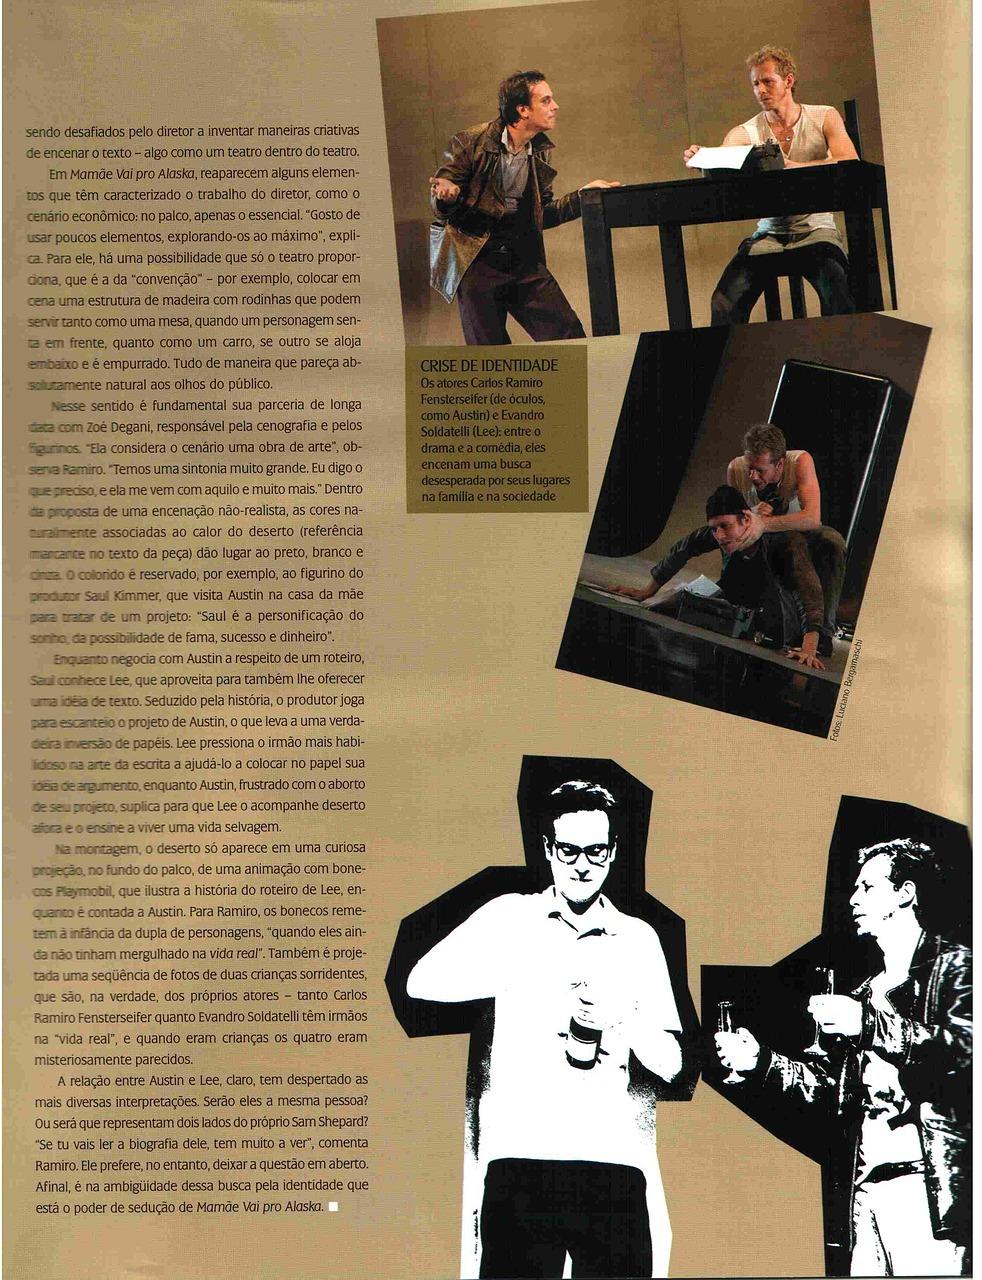 Revista+Aplauso+nº+81+-+Dez+2006+-+2ª+pg.jpg